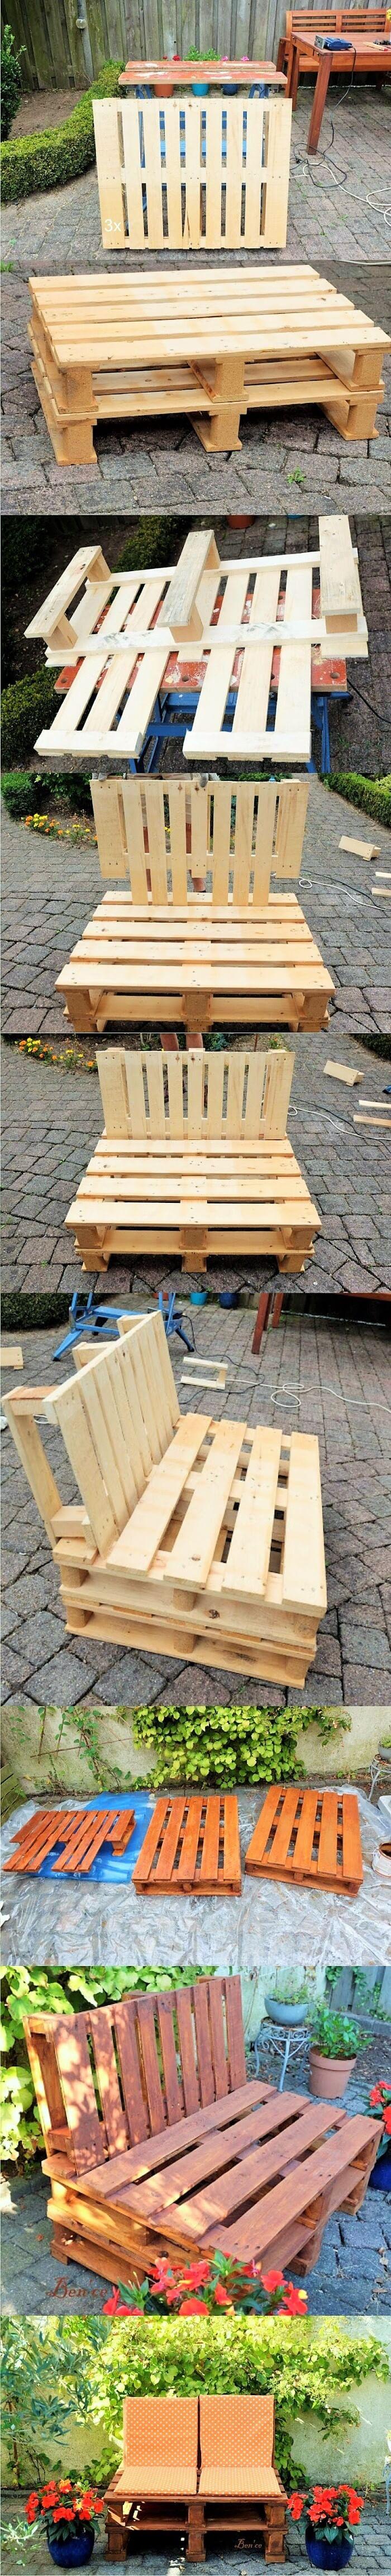 diy-pallets-furniture-garden-sofa-ideas